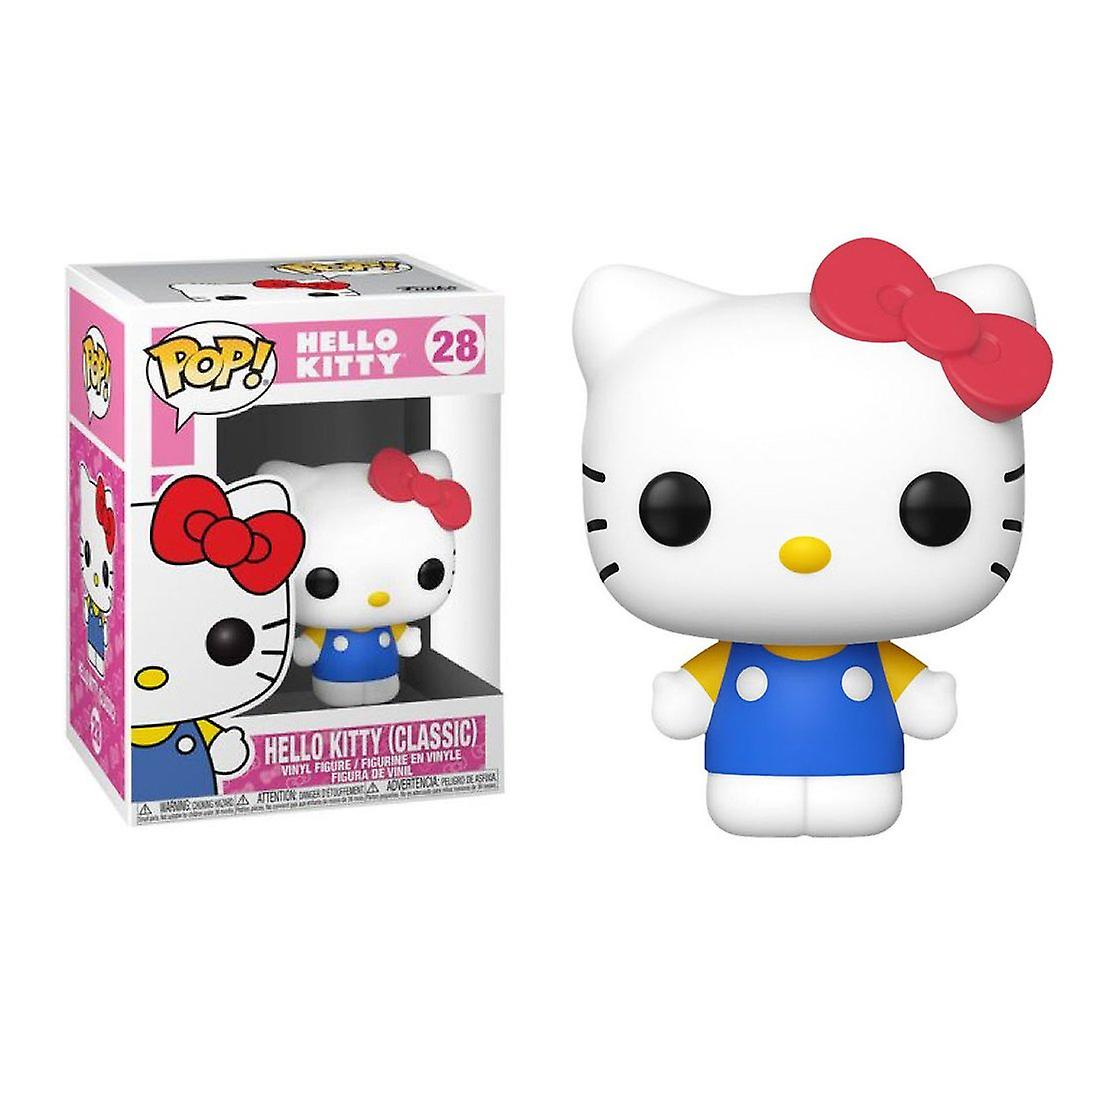 Hello kitty classic pop! vinyl figure